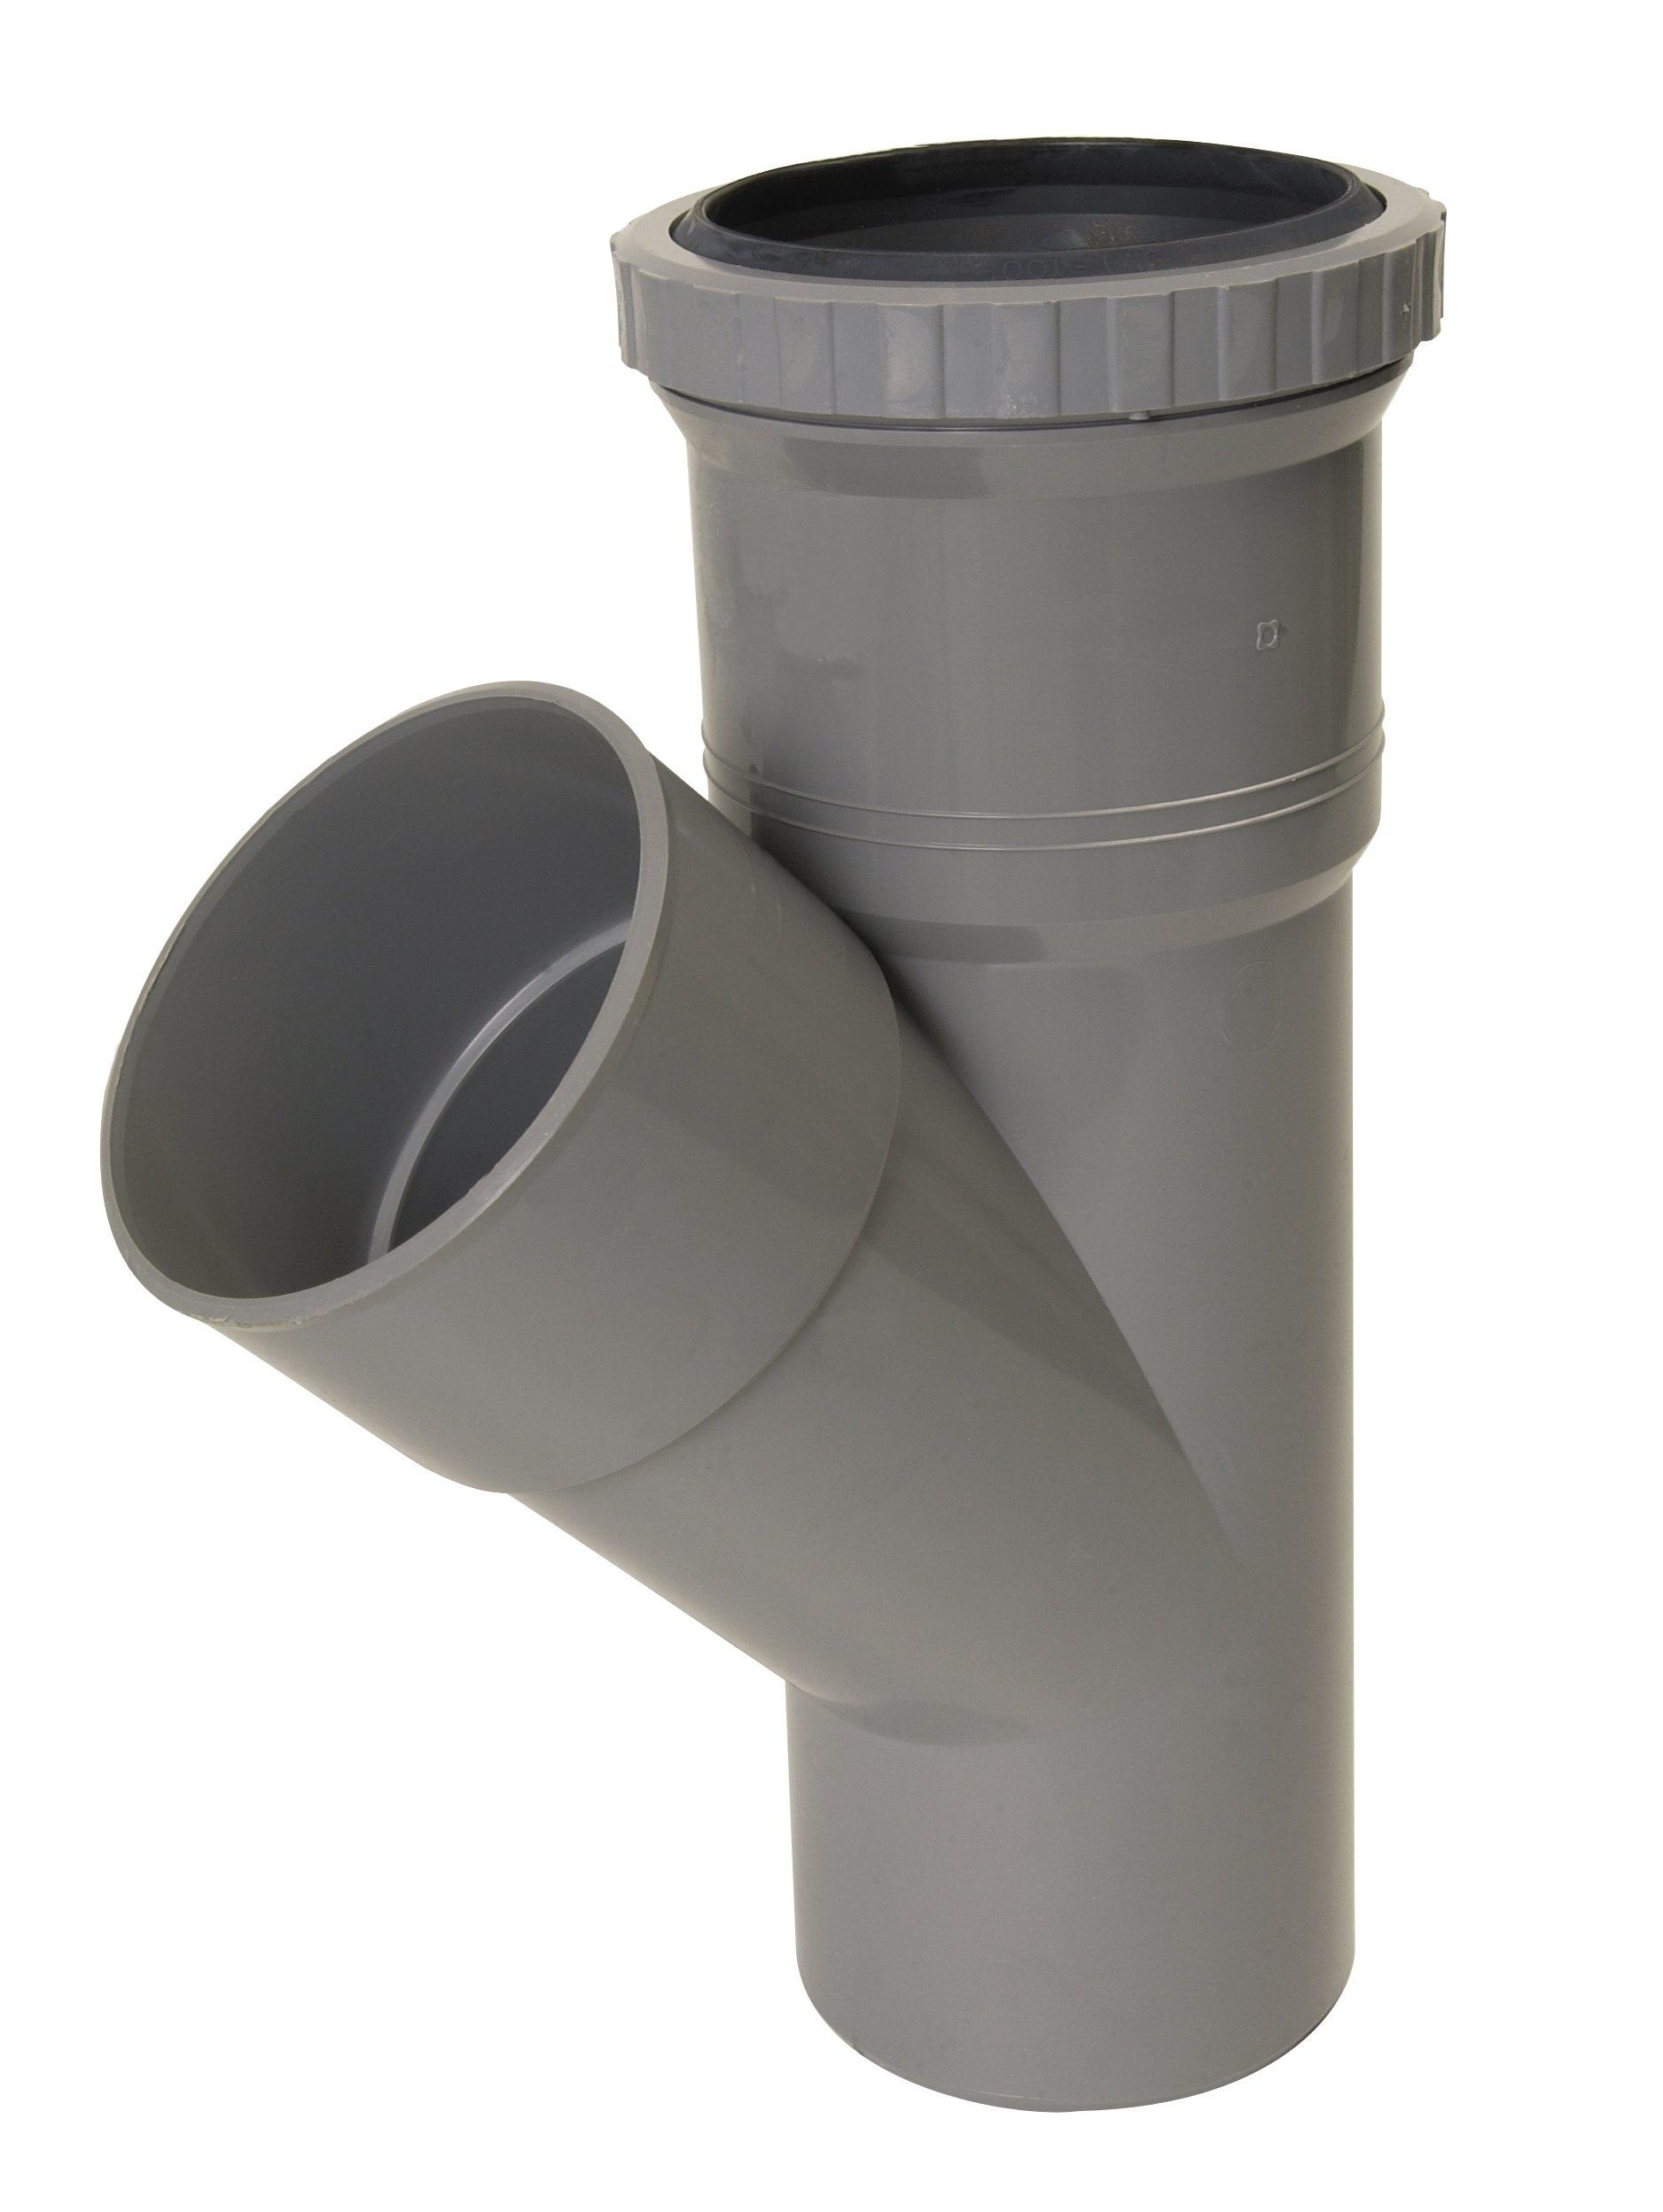 COUDE PVC 87°30 MALE FEMELLE 32 40 50 RACCORD JONCTION TUBE EAUX USEE EVACUATION